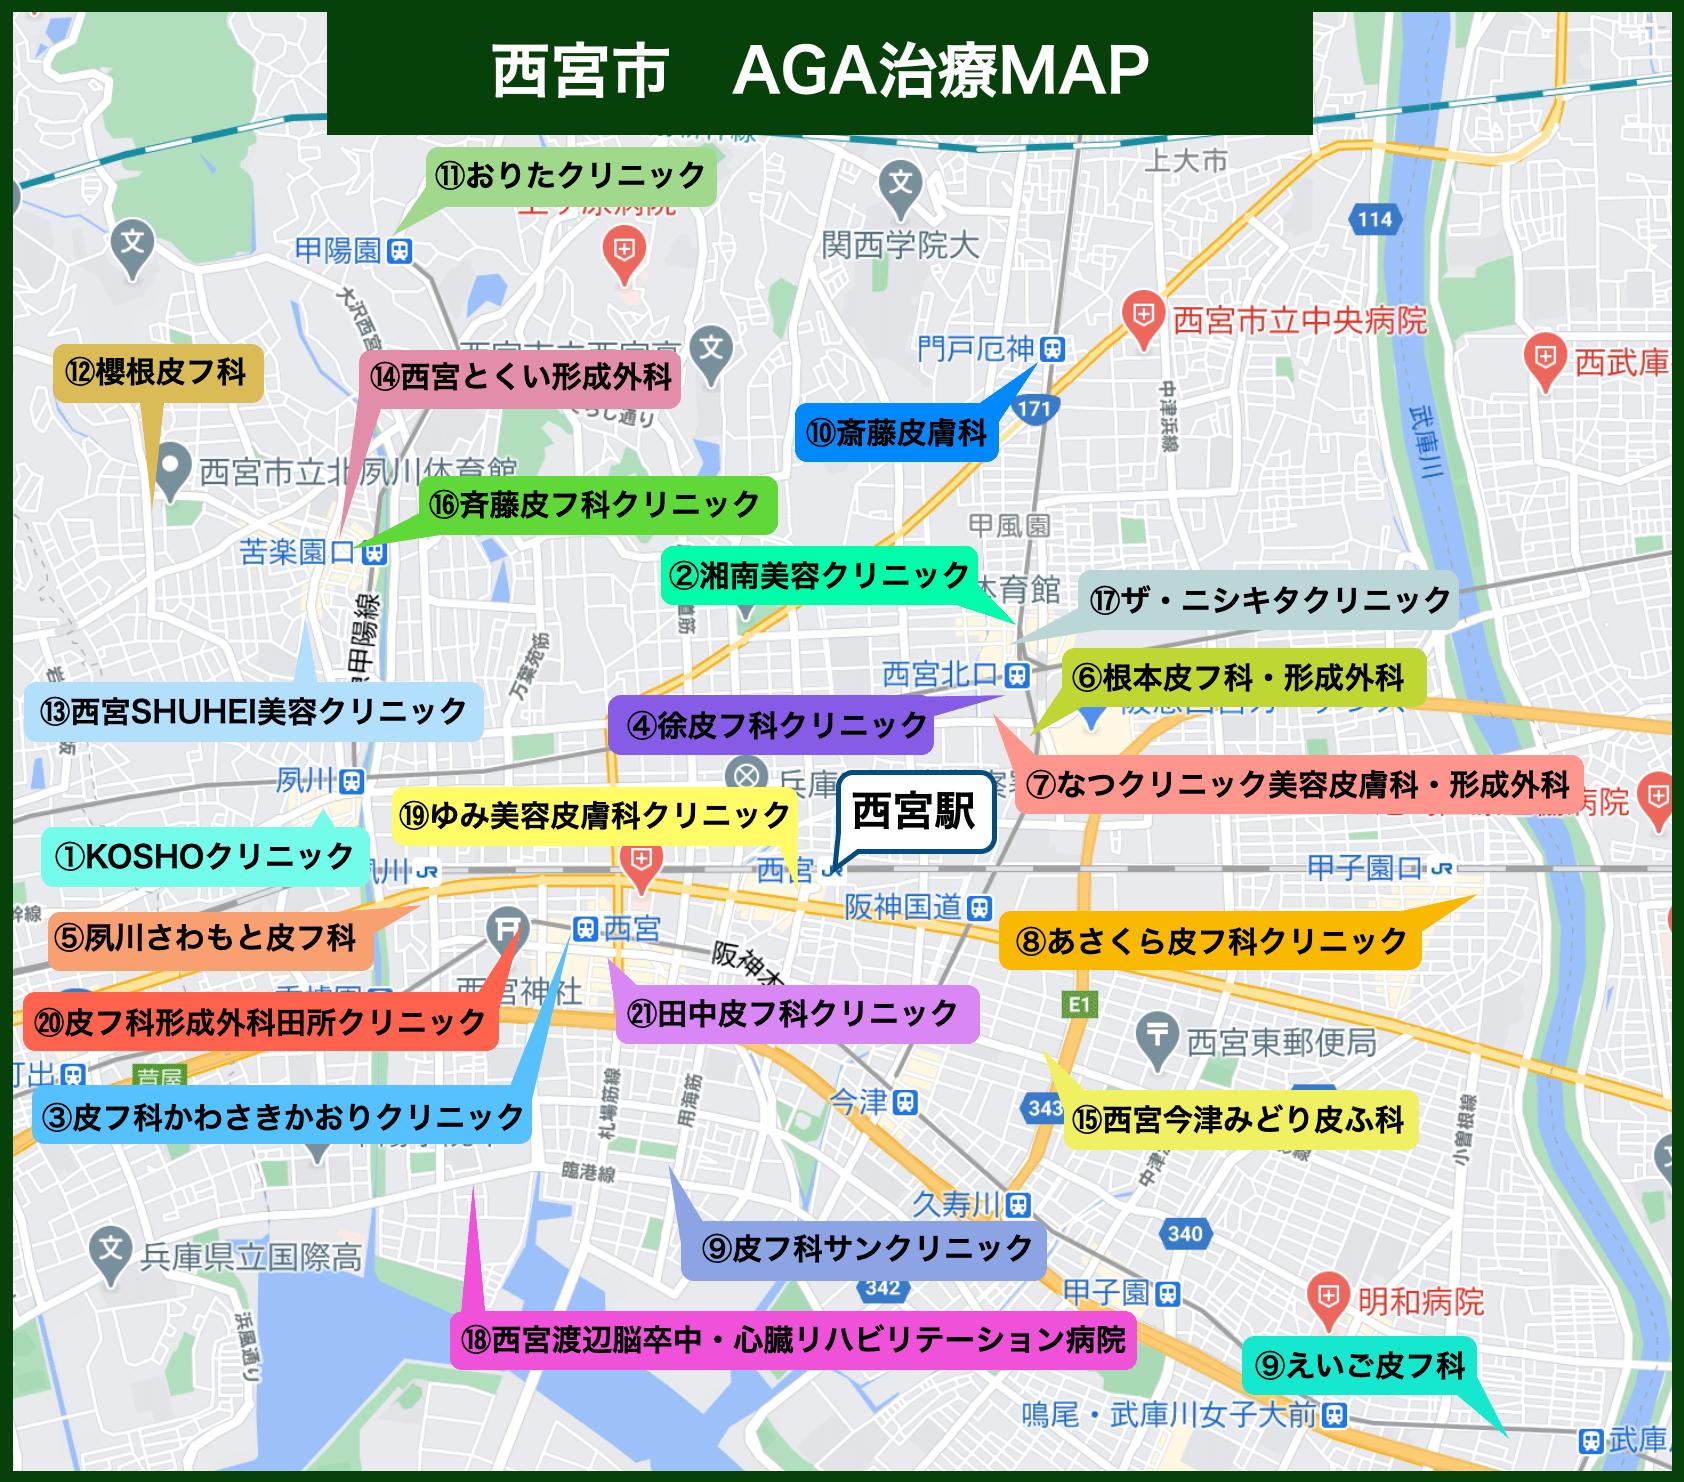 西宮市 AGA治療MAP